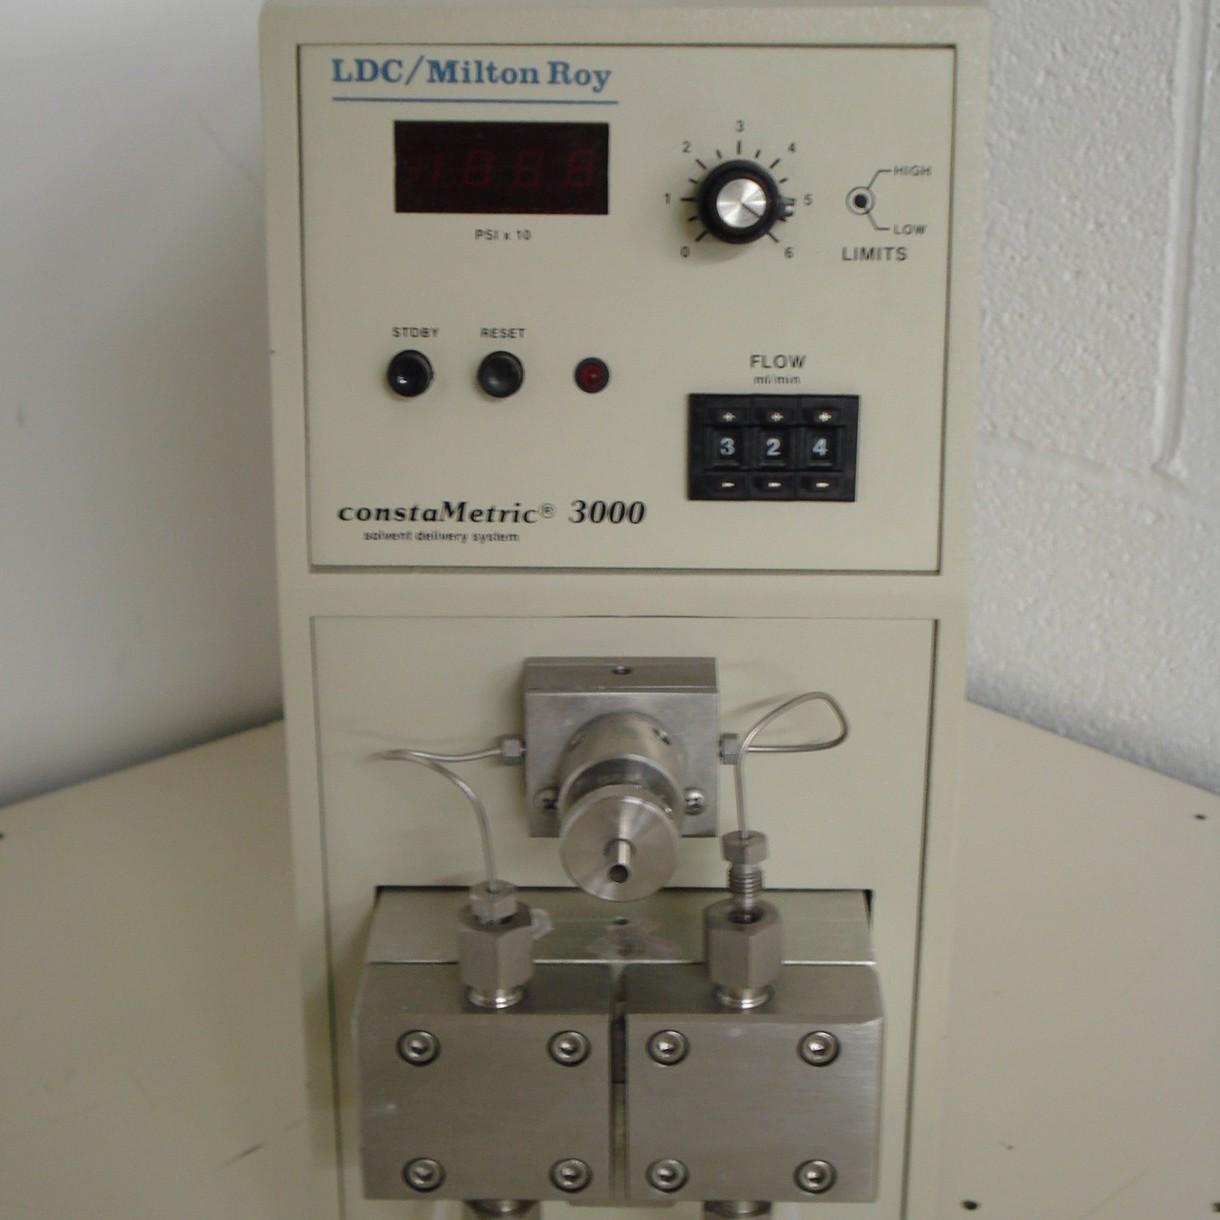 LDC / Milton Roy ConstaMetric 3000 Solvent Delivery System Image